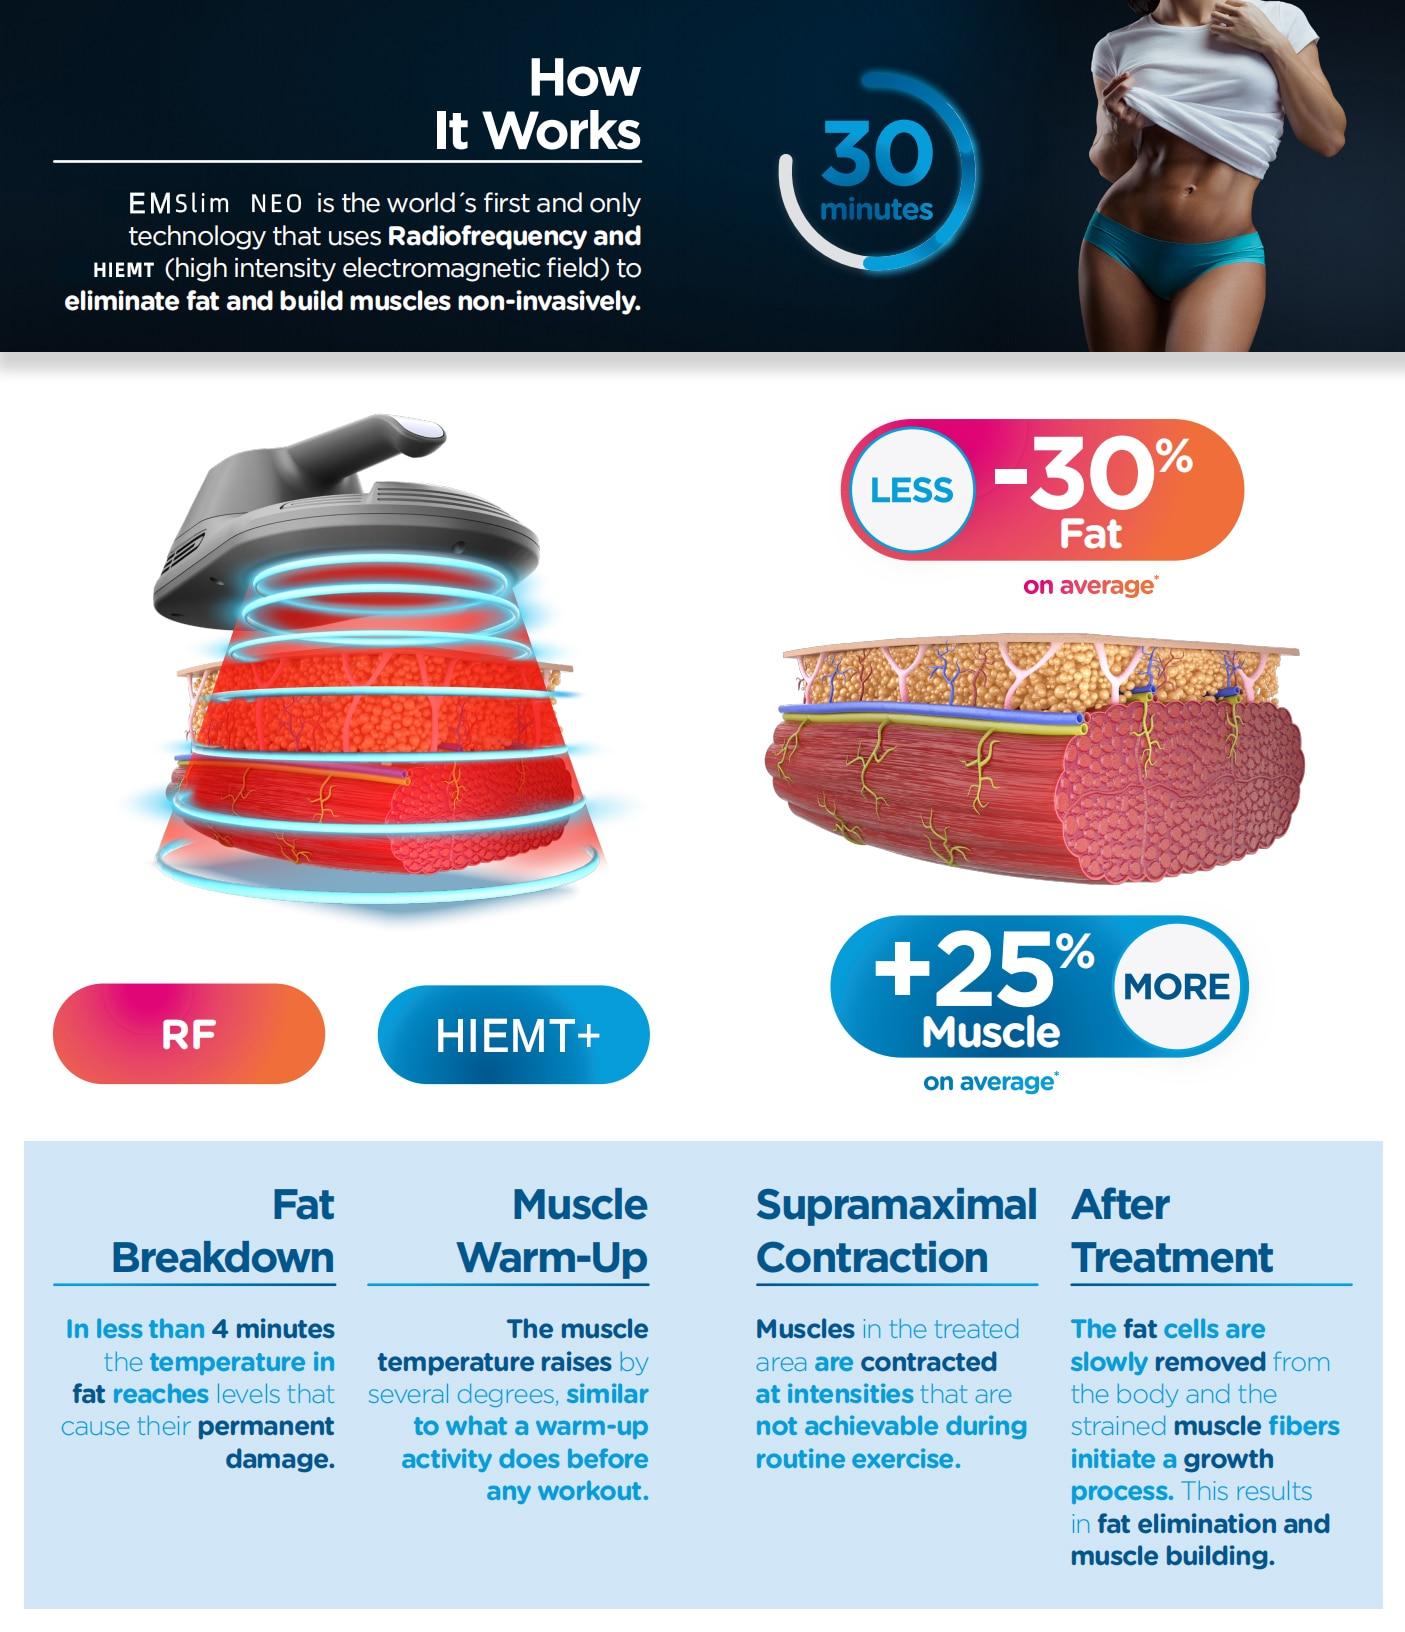 Professional EMslim Nova EMS Muscle Stimulator Body Sculpting Butt Lift Fat Removal Machine